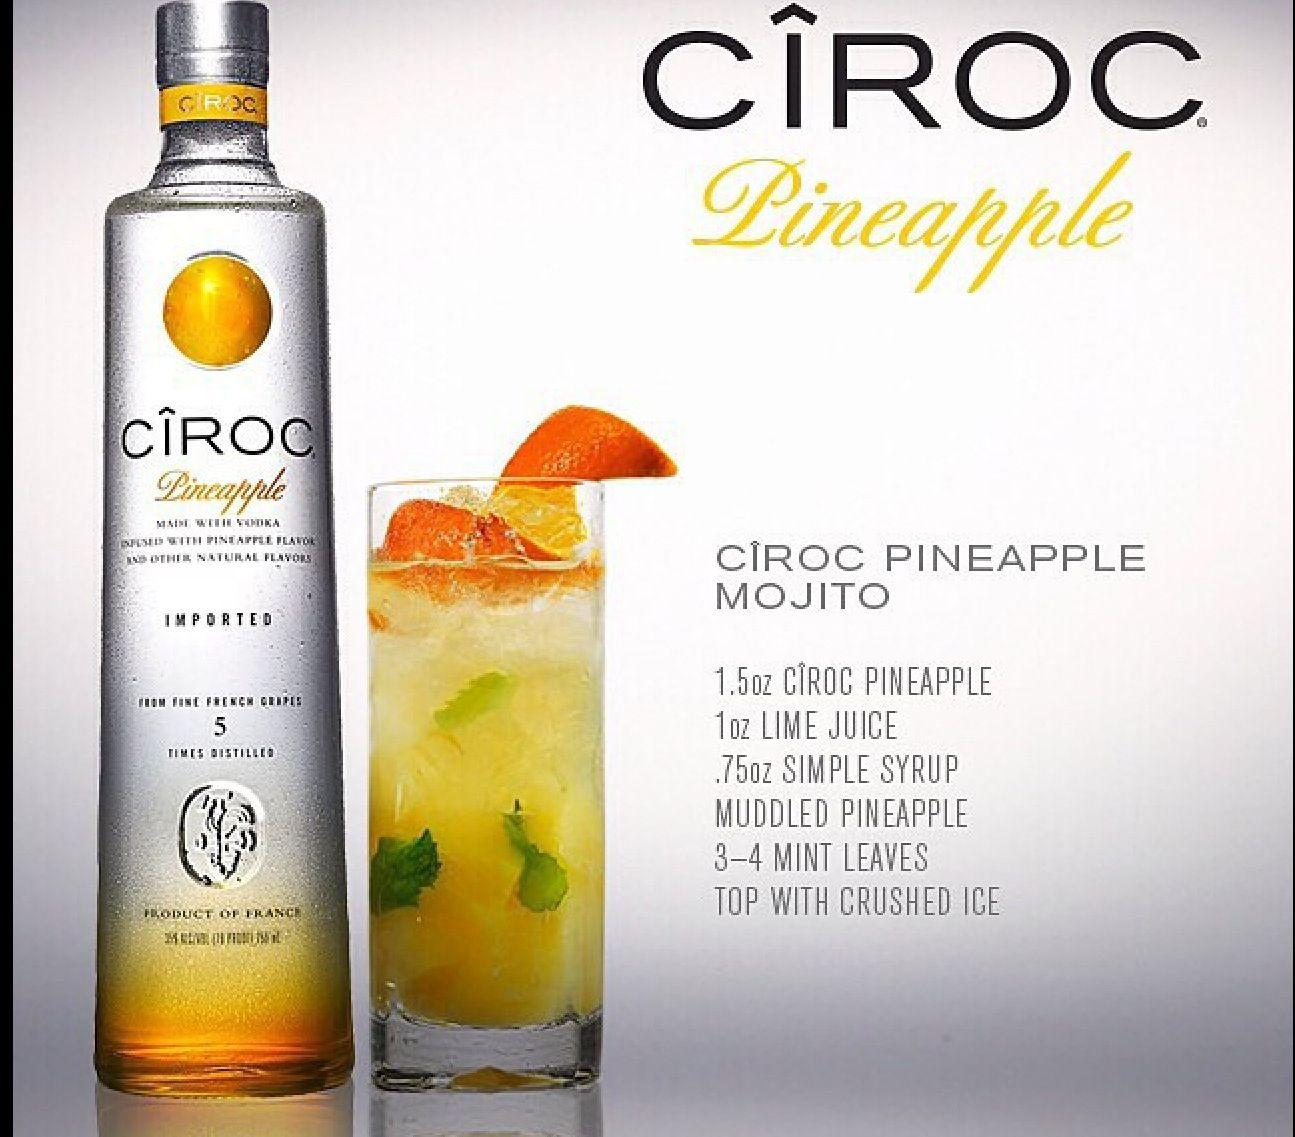 Pineapple Mojito Ciroc Vodka Mixed Drinks Recipes Drinks Alcohol Recipes Pineapple Vodka